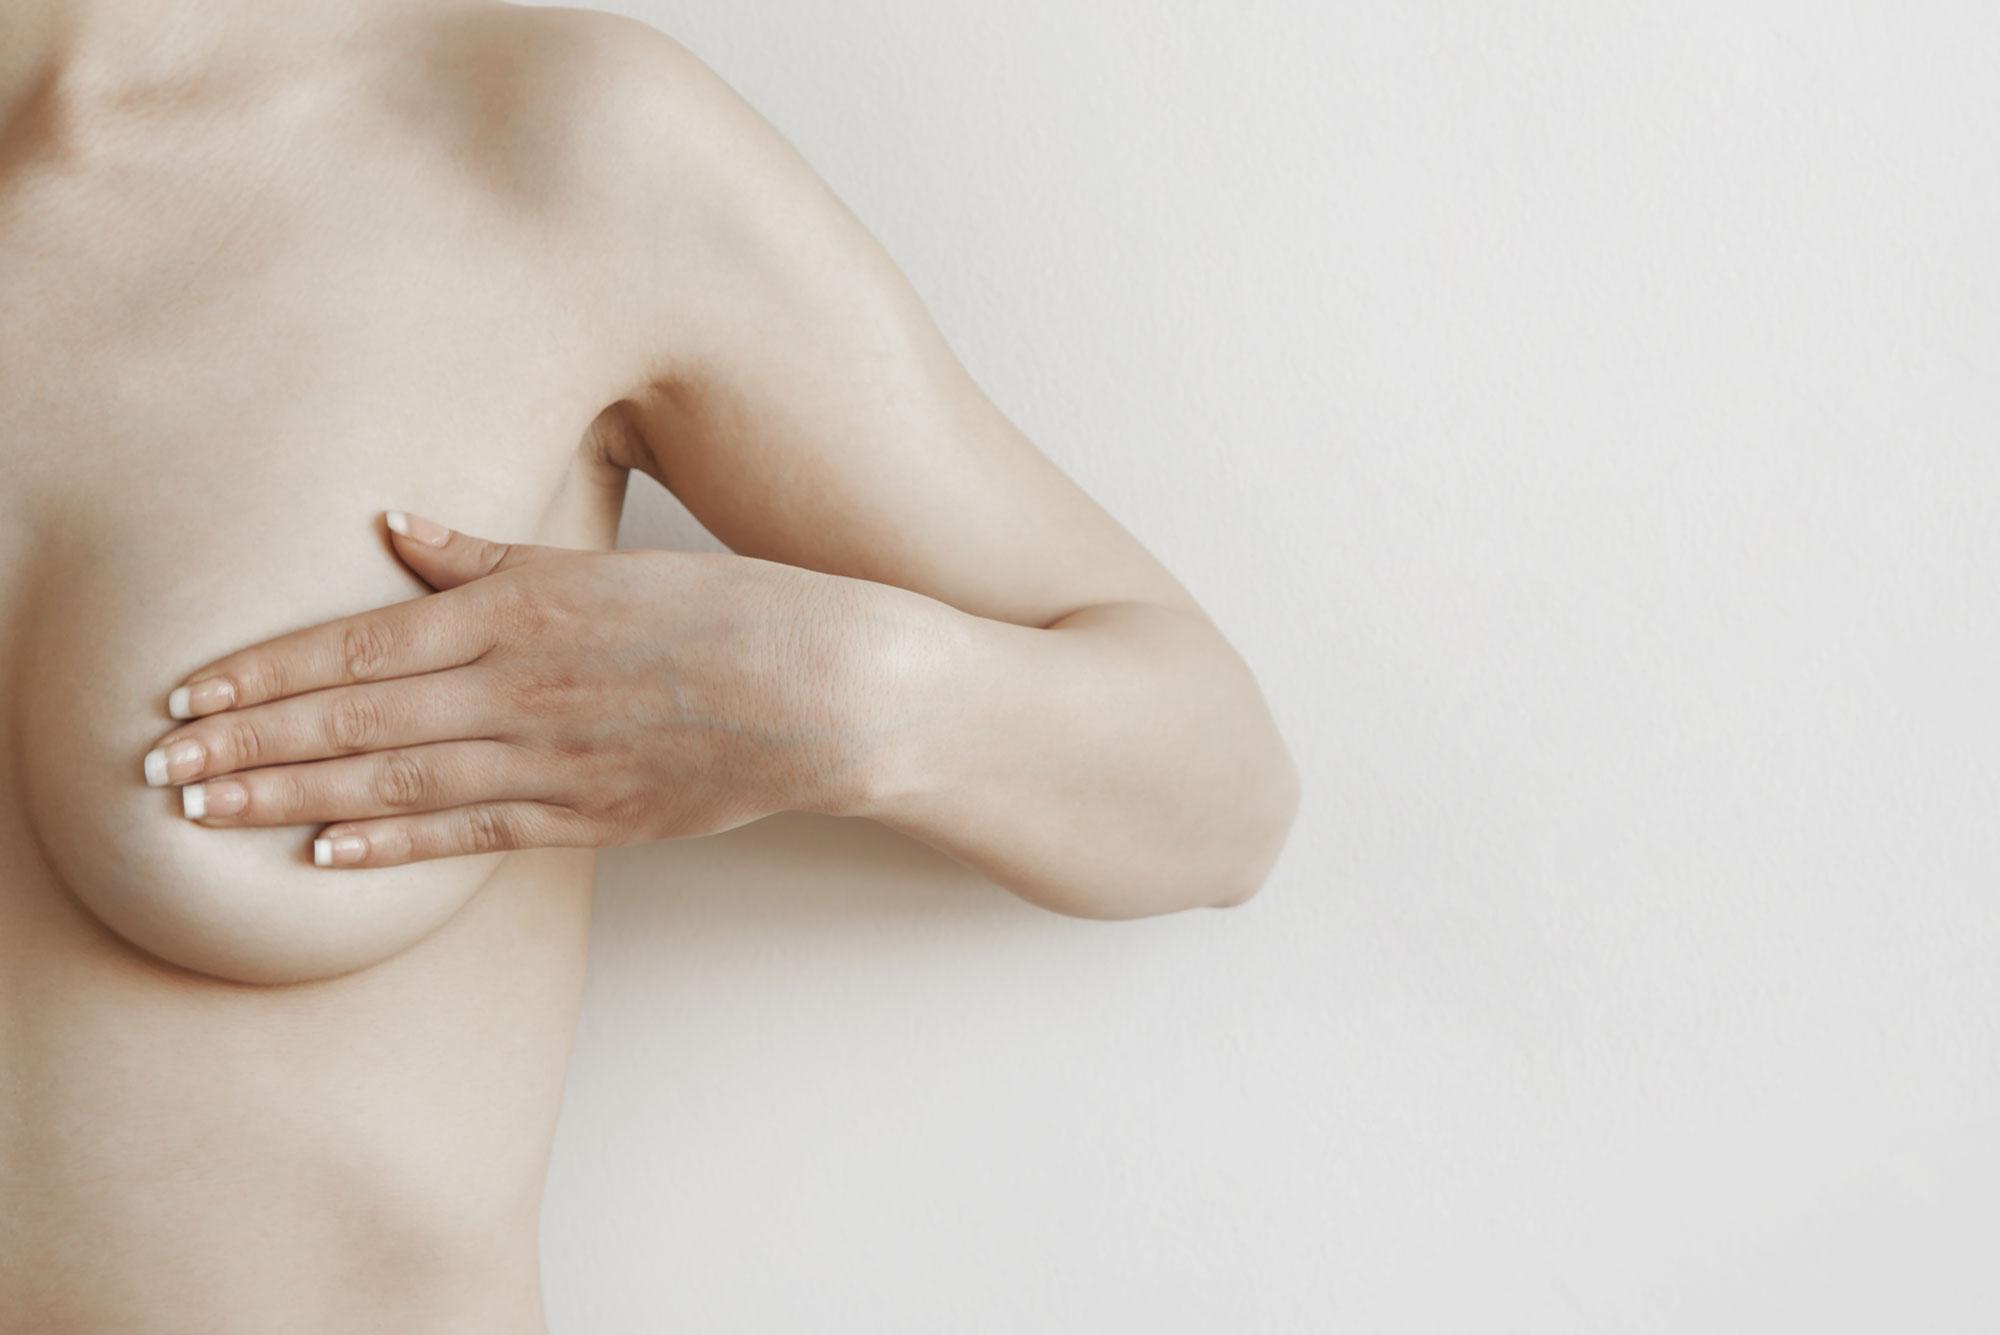 Breast Augmentation | Dr. Daniel Lee in McAllen